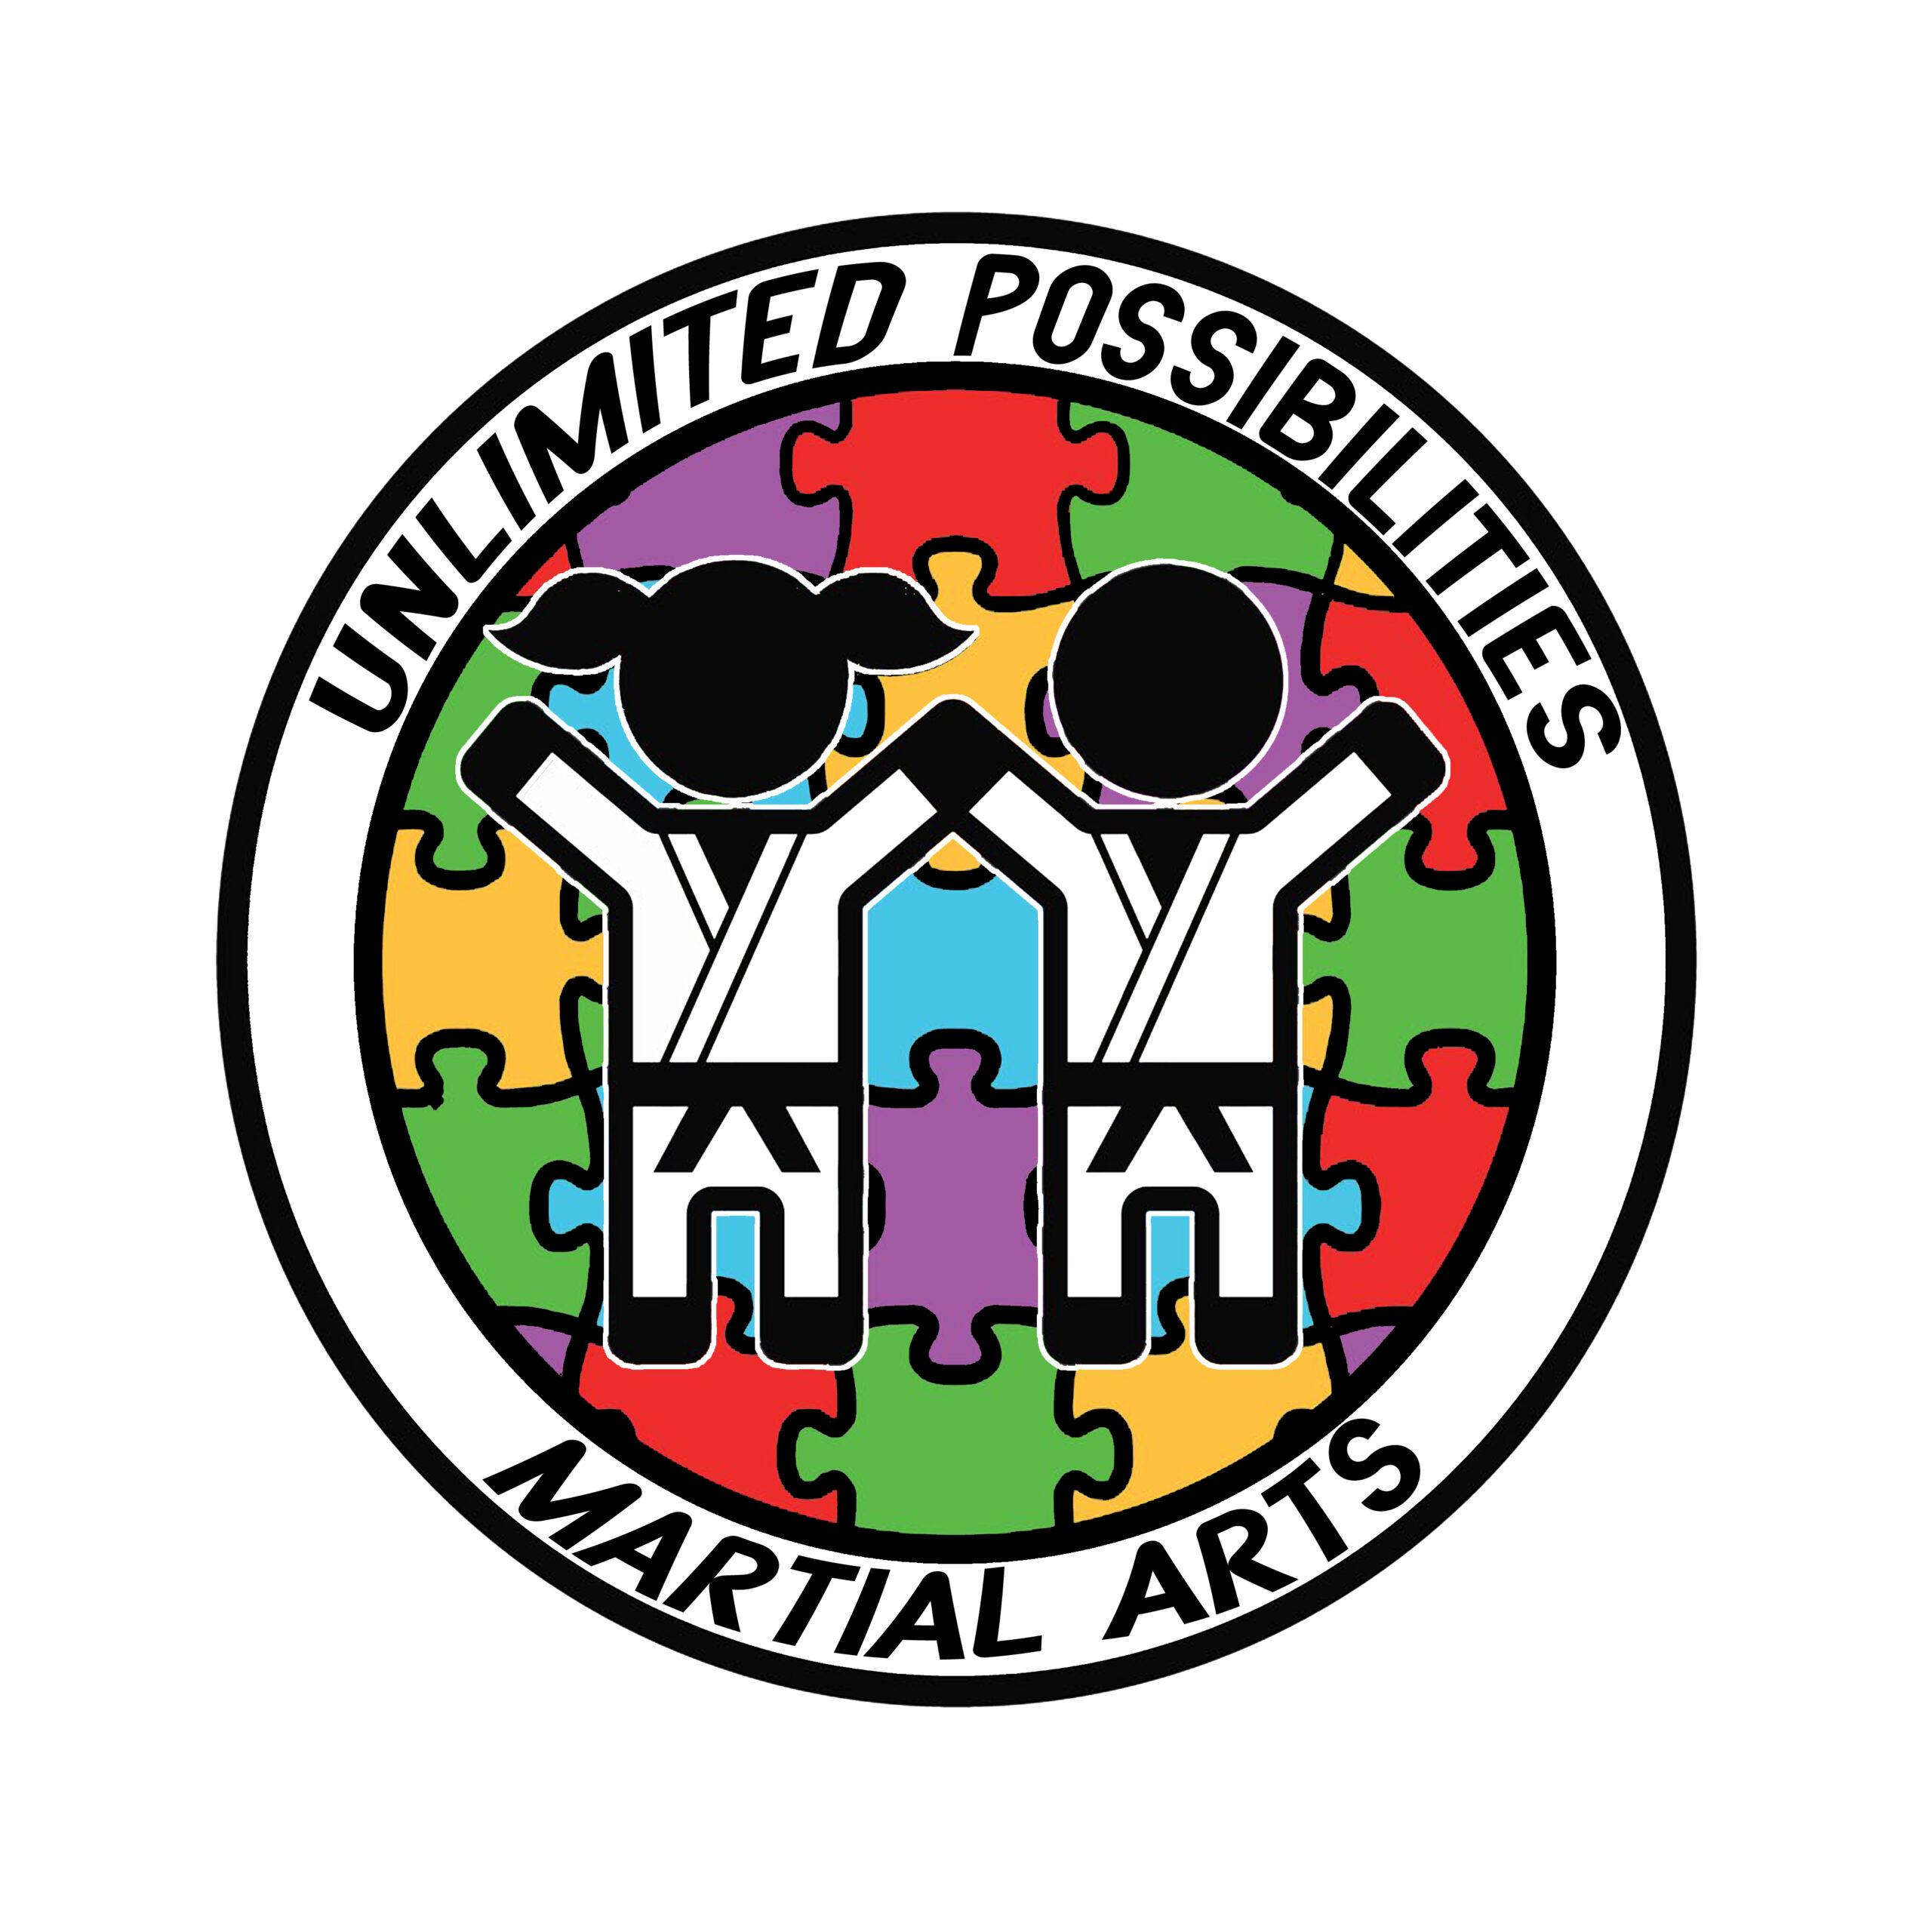 Unlimited Possibilities Martial Arts